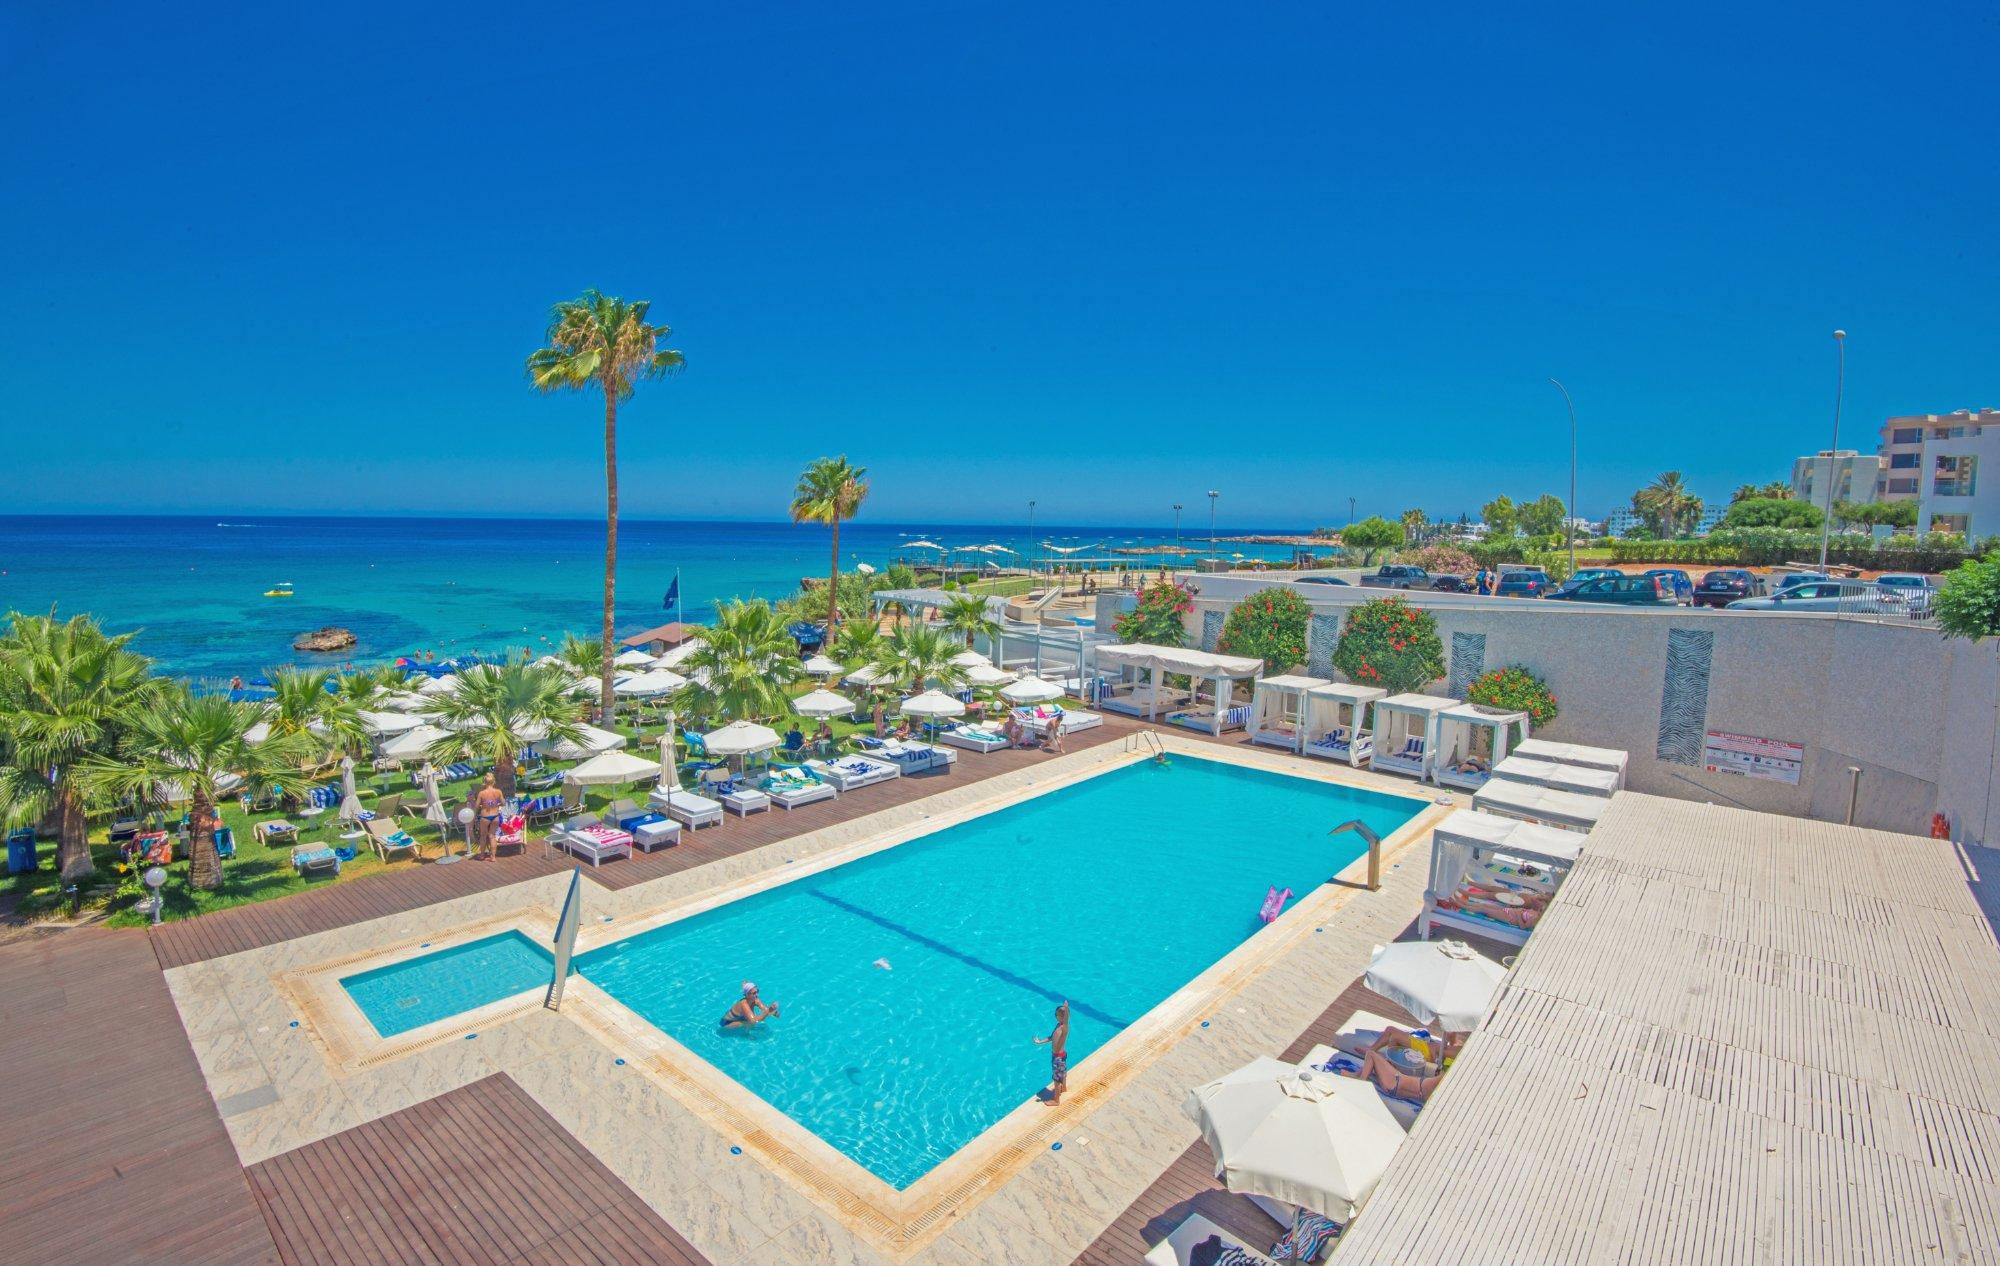 Отзыв об отеле Odessa 4 на Кипре Протарас от zya369